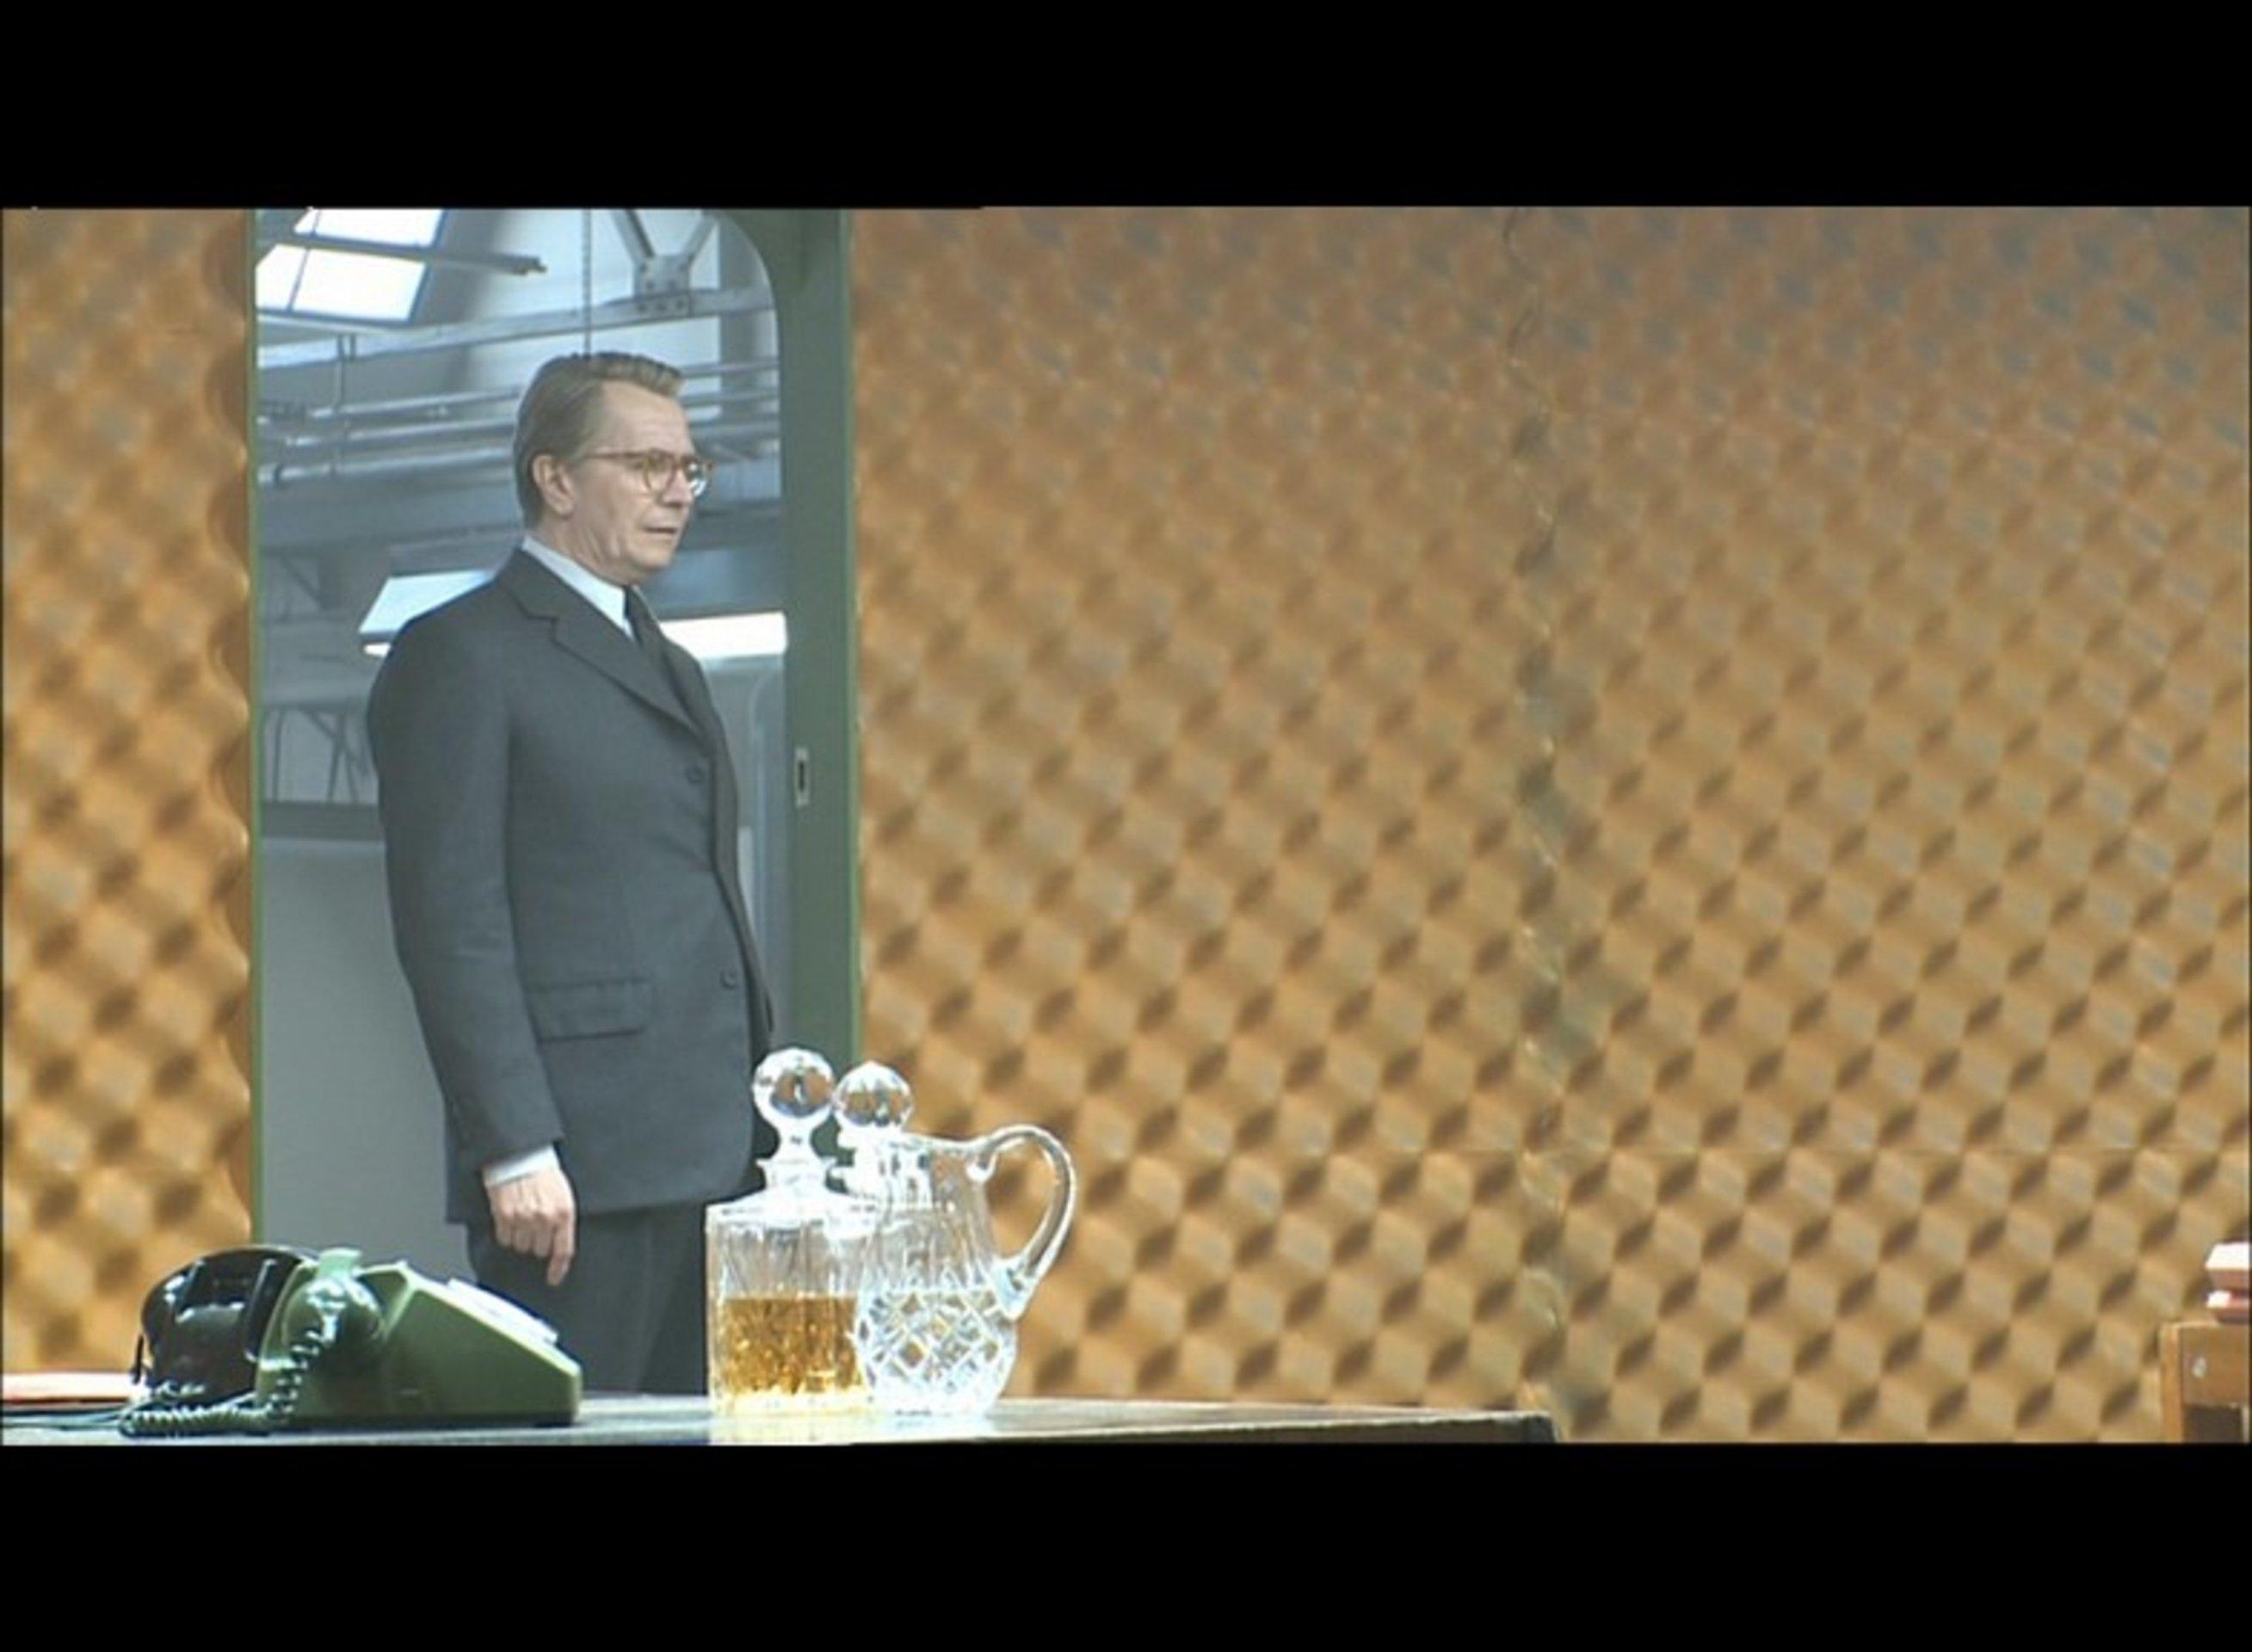 kino nykøbing f xxdark København